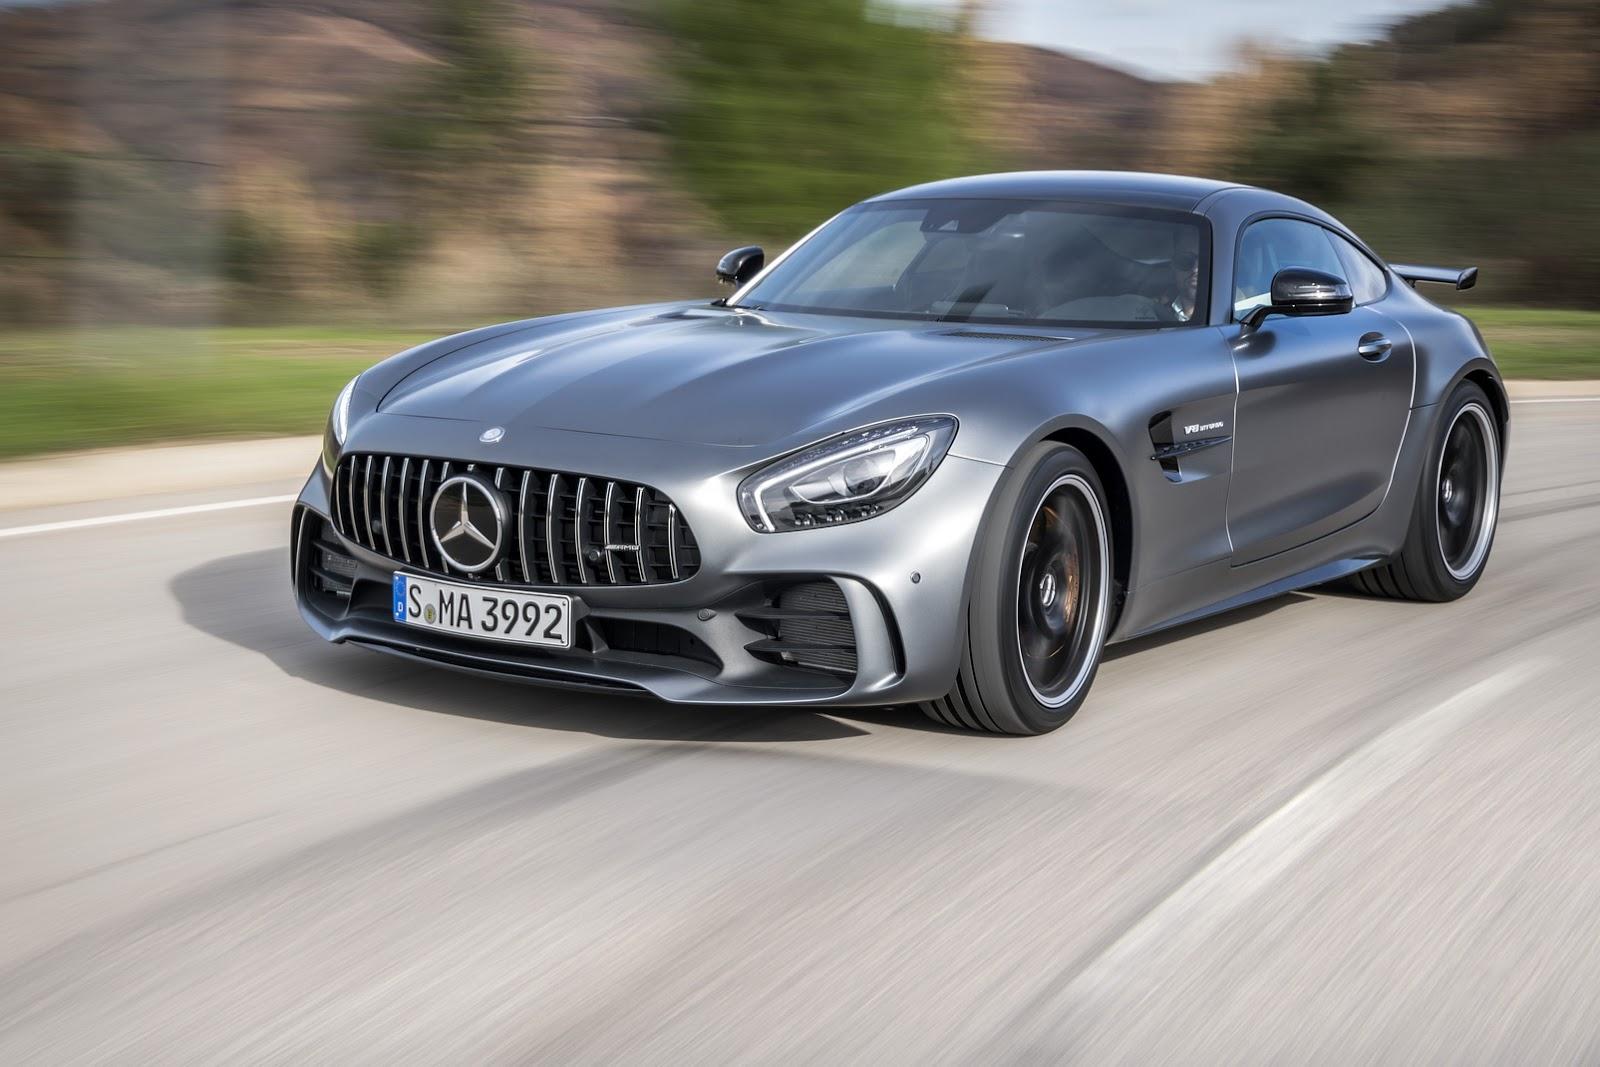 Mercedes-AMG GT Black series takes shape - Autocar India